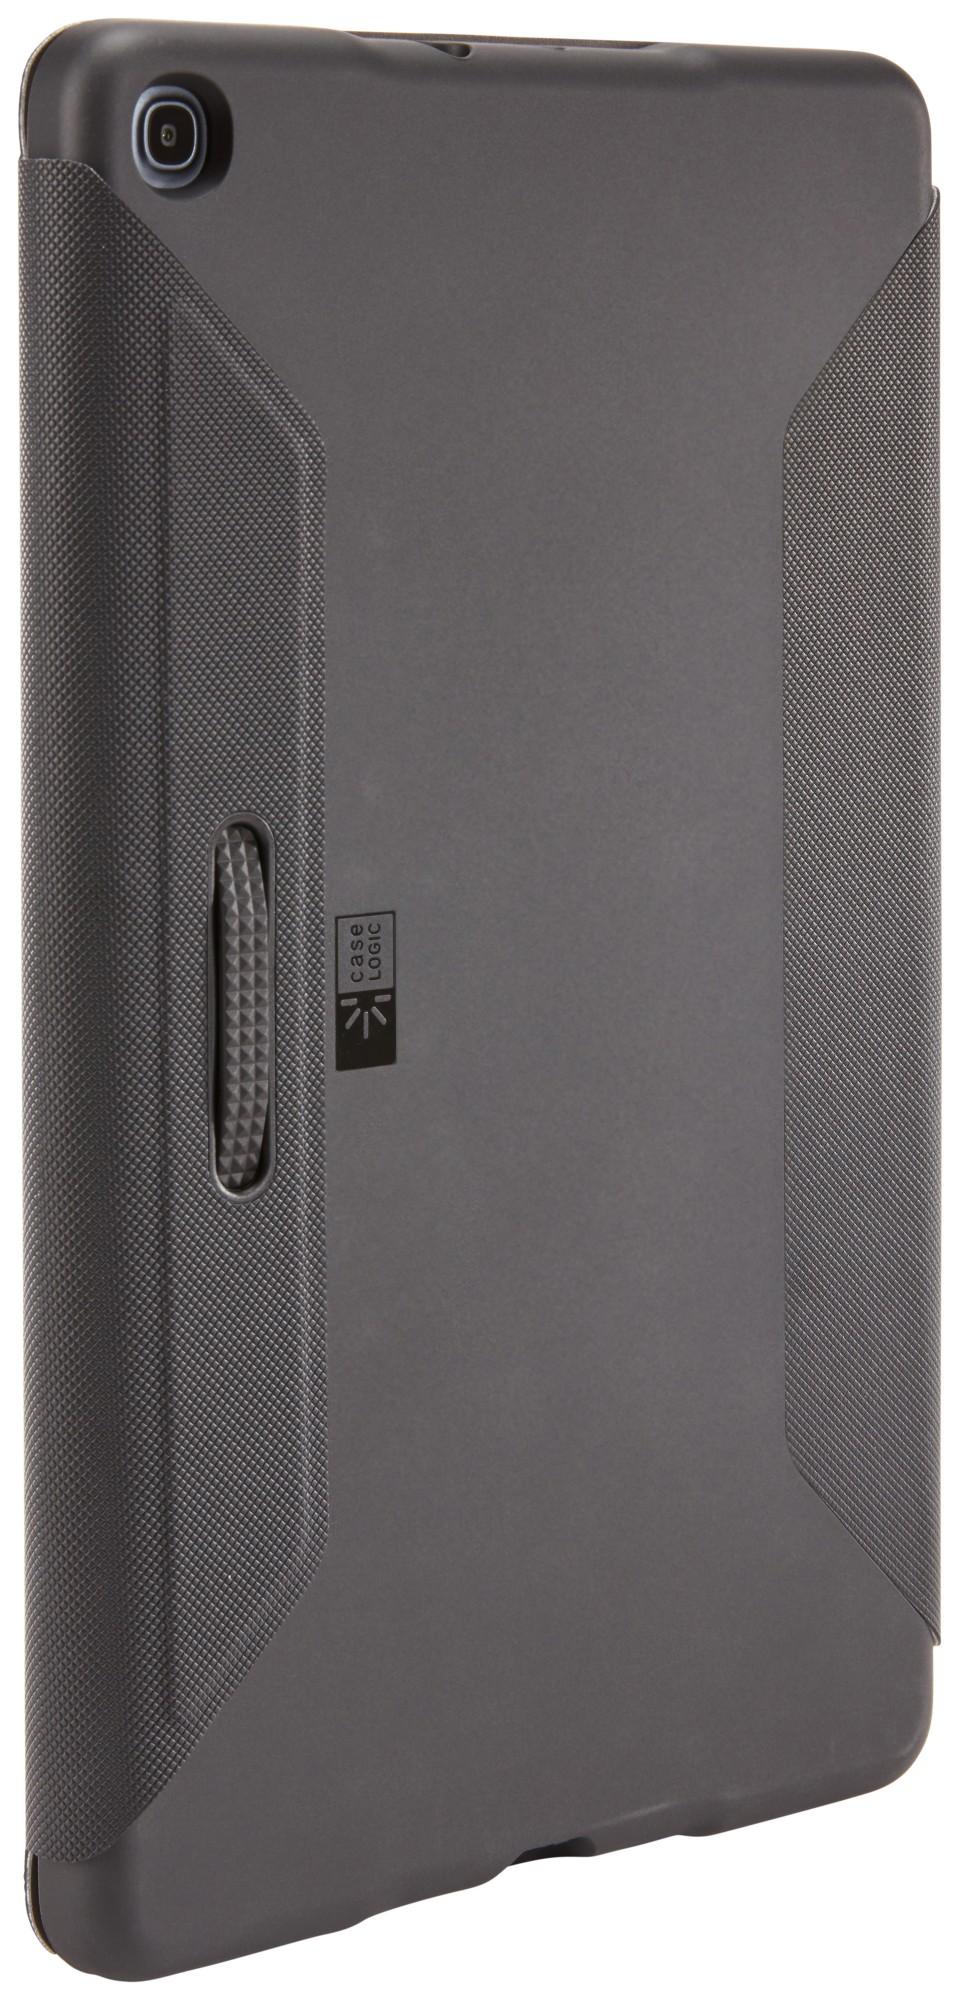 "Case Logic SnapView 25,6 cm (10.1"") Folioblad Zwart"